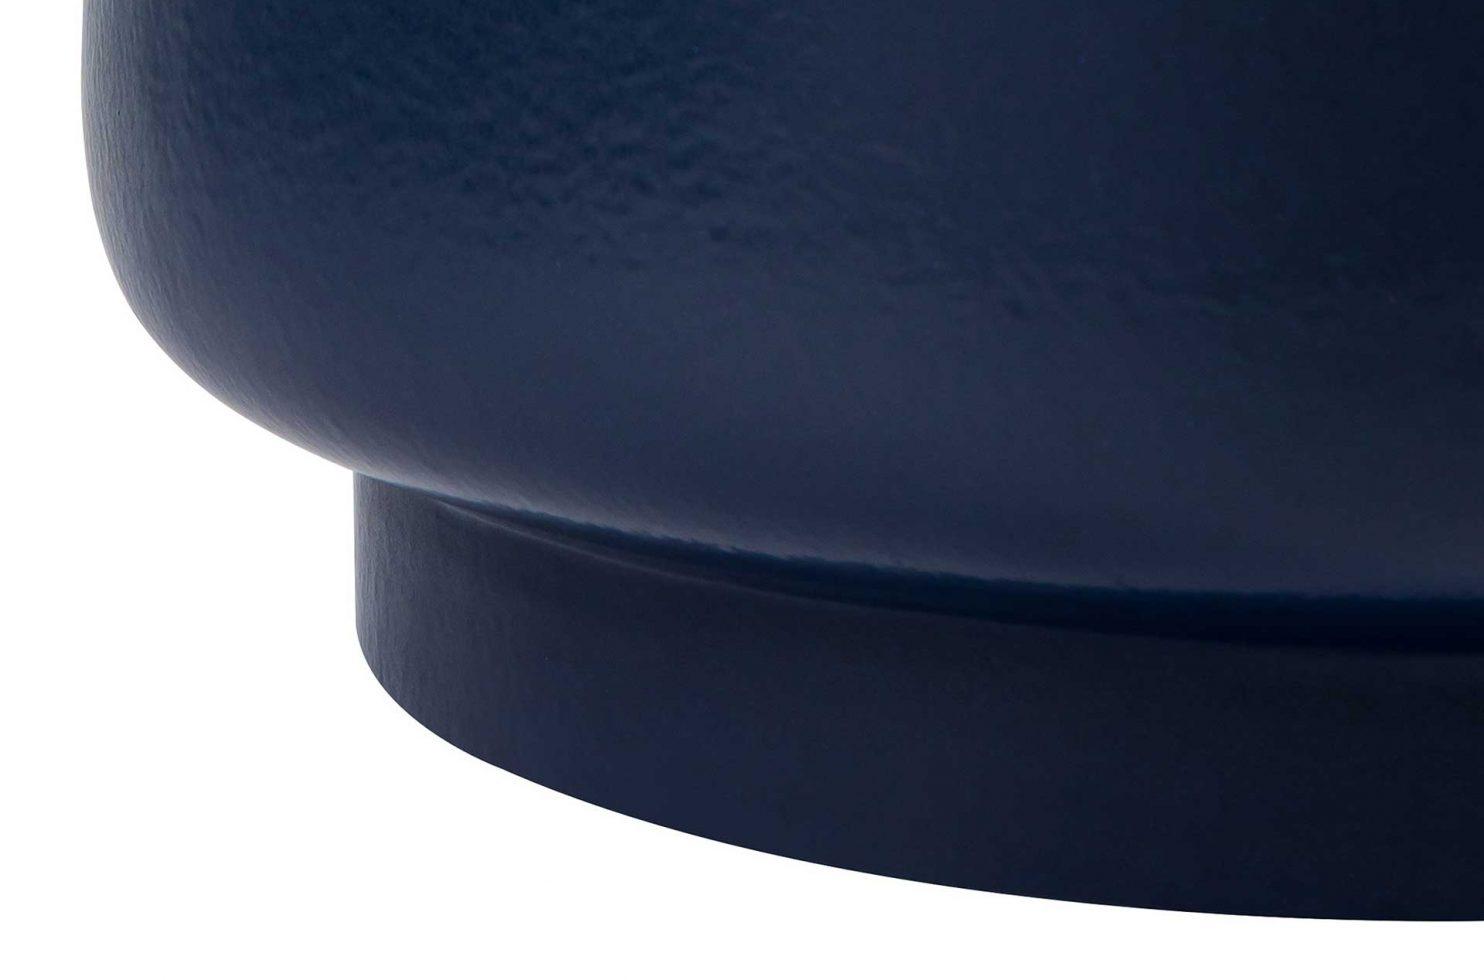 prov cer balance stool 18in C30804533 indigo dtl2 web